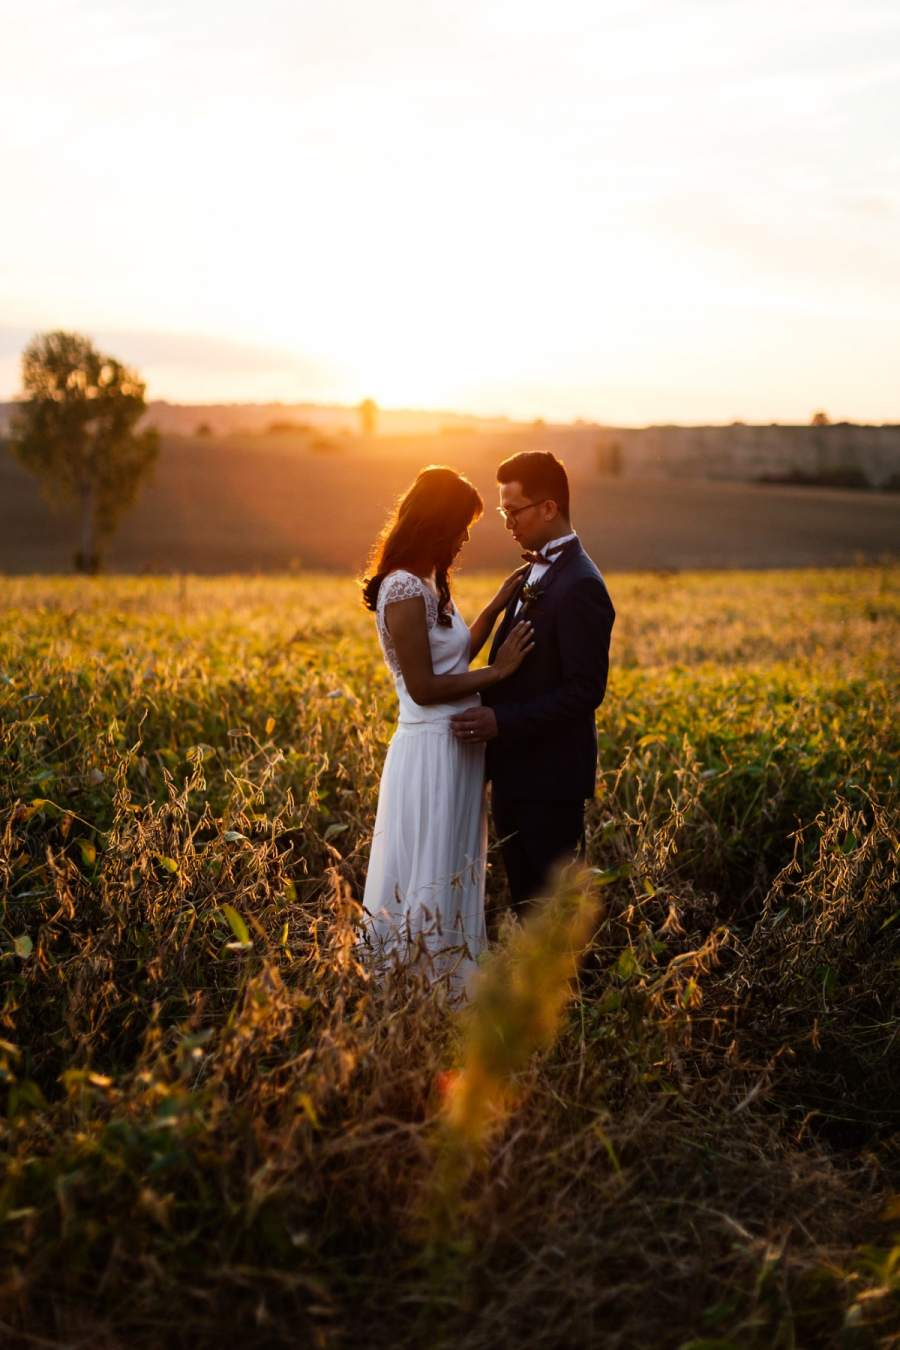 mariage-flora-micka-domaine-de-ronsac-sainte-foy-d-aigrefeuille-945.jpg